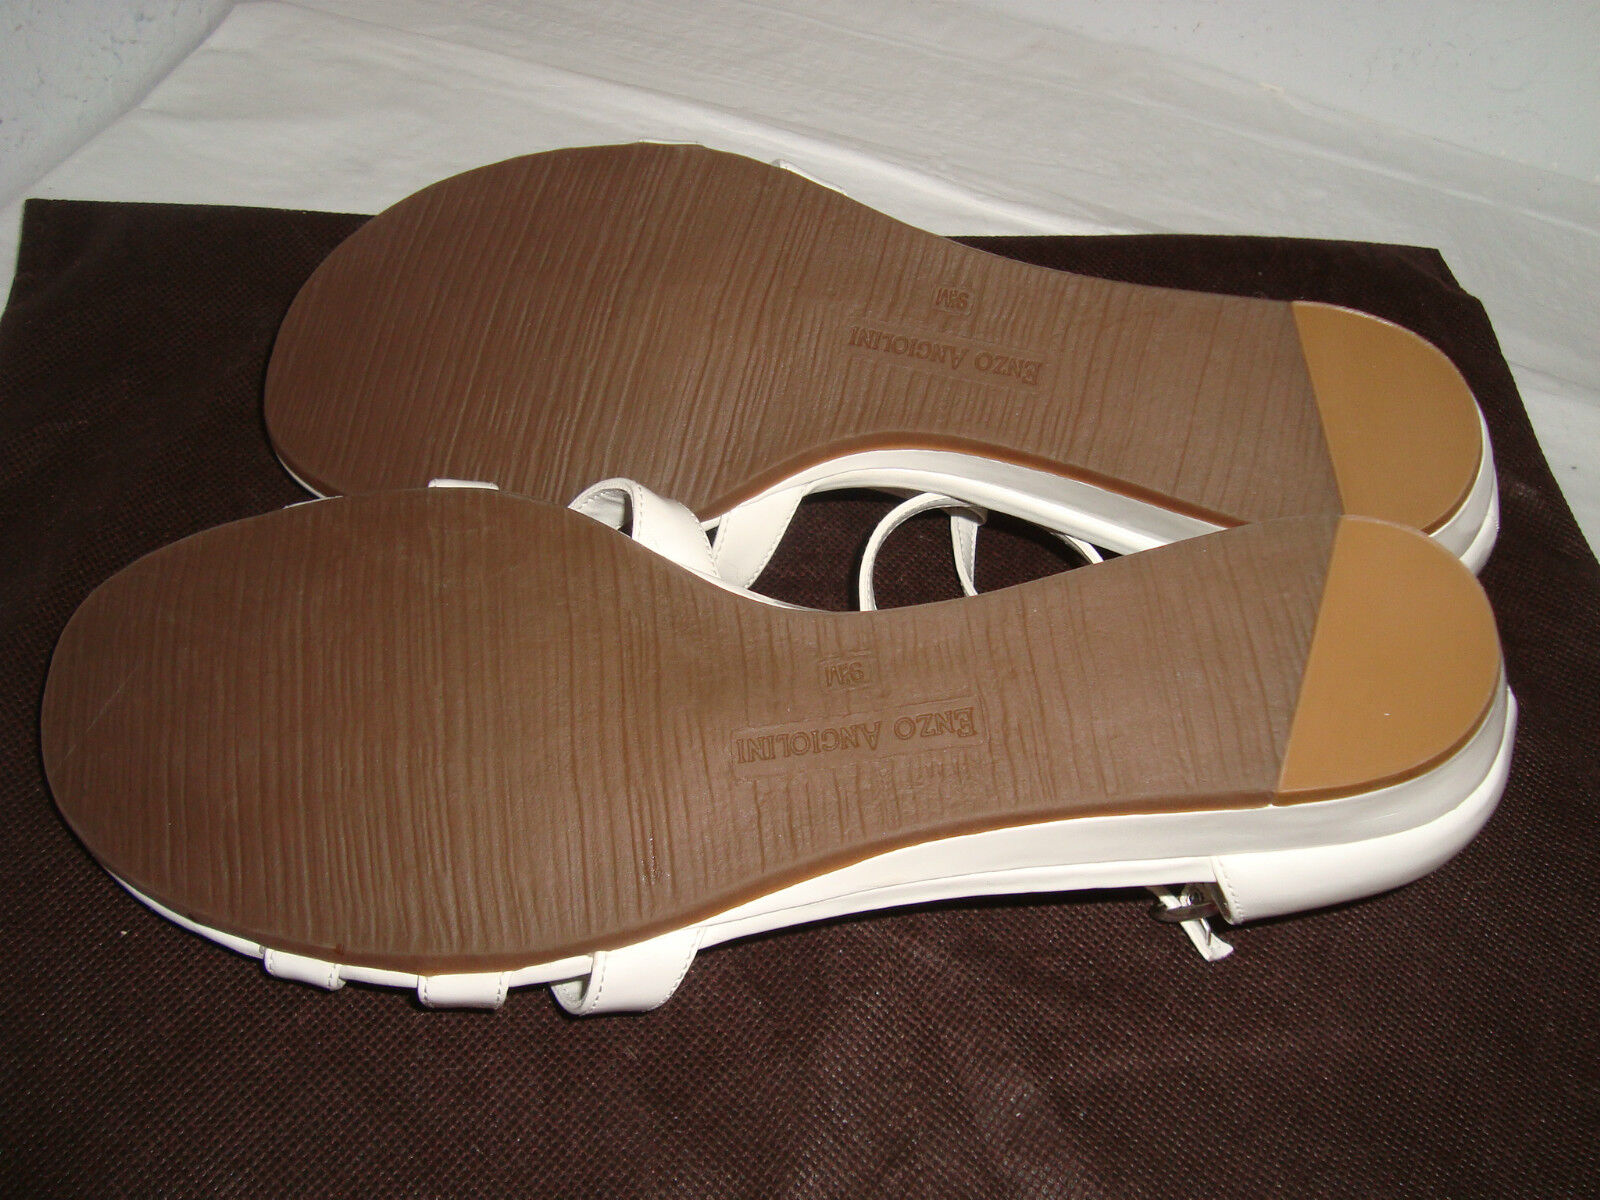 Enzo Angiolini New Damenschuhe Nyler Weiß Wedge Patent Wedge Weiß Sandales 9.5 M Schuhes NWOB e0a2df